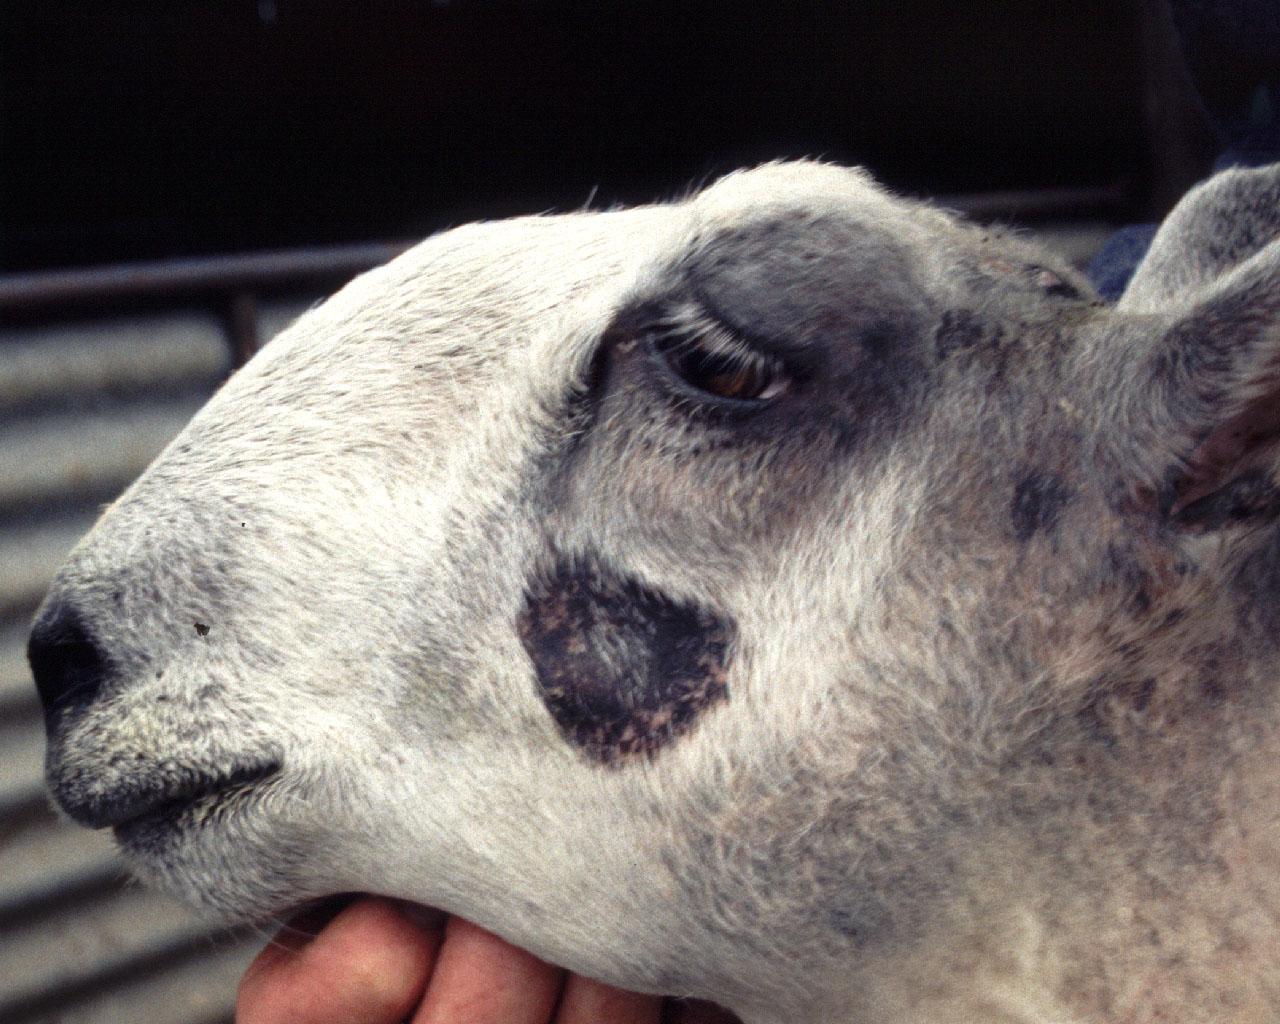 sheep flock health sargison neil